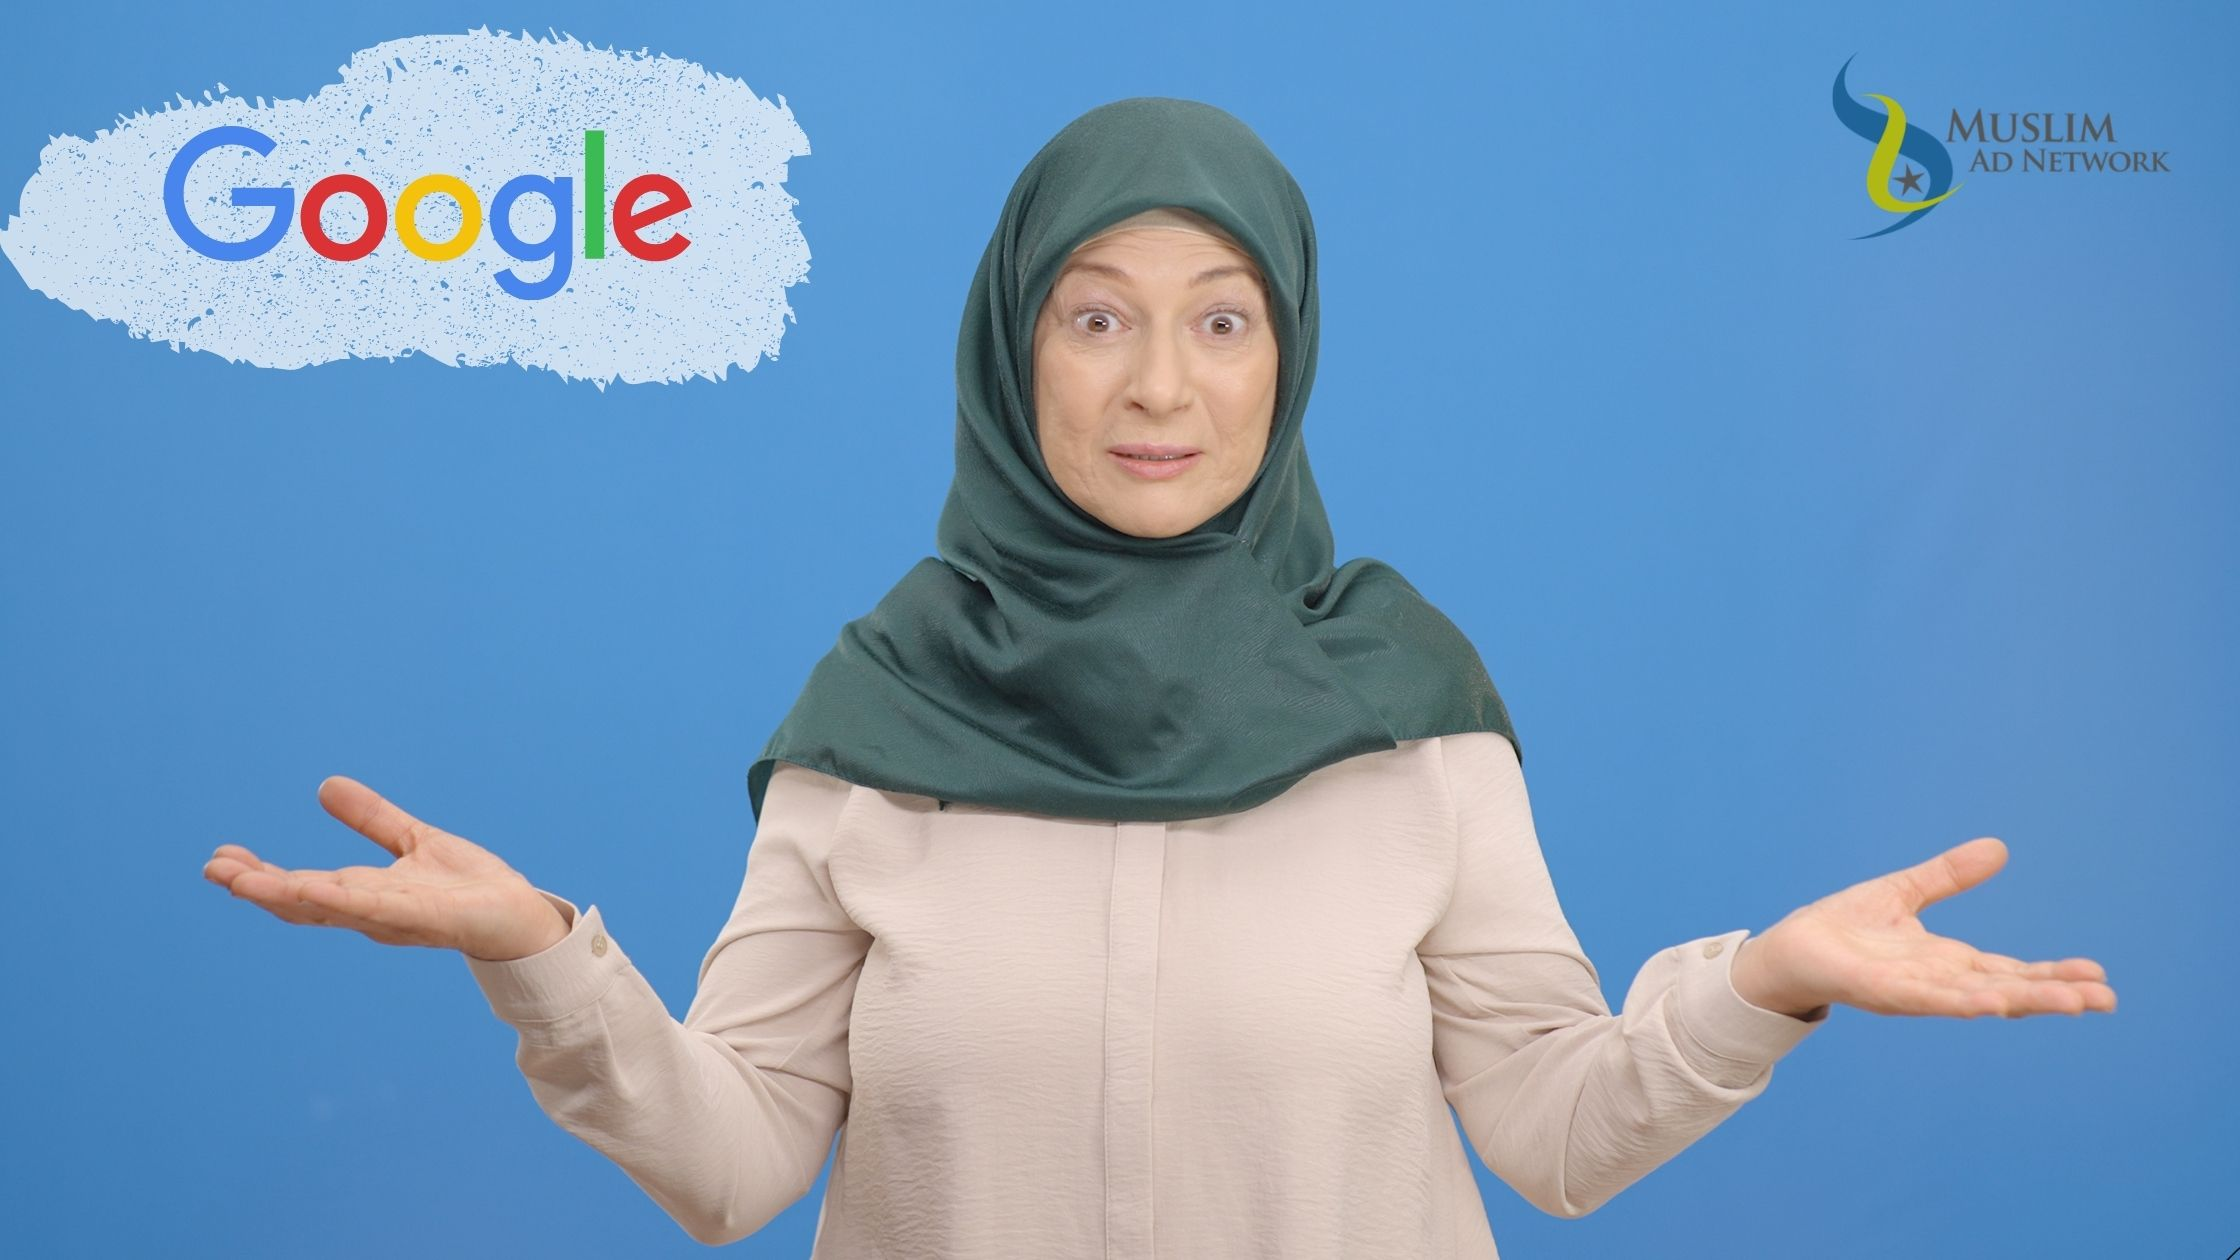 Muslim Advertising FLoC